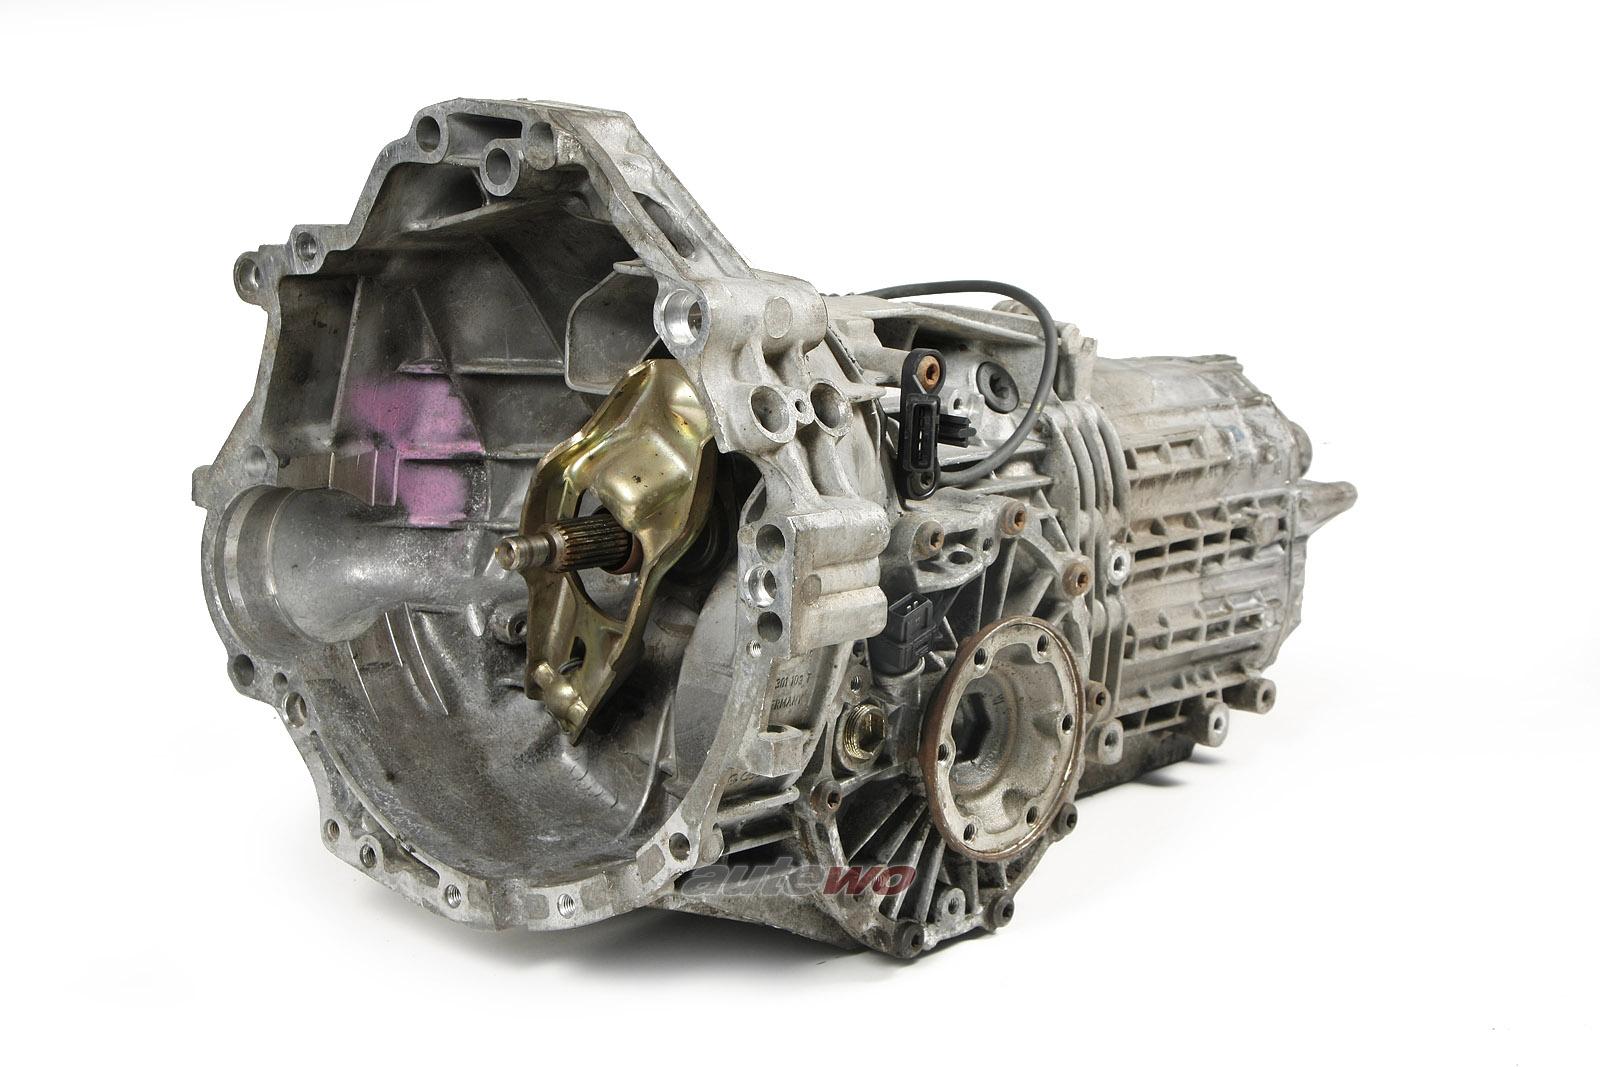 012300053CX Audi/VW 80 Typ 89 Cabrio/A4 B5/A6 C4 1.8l Getriebe DHZ 11068